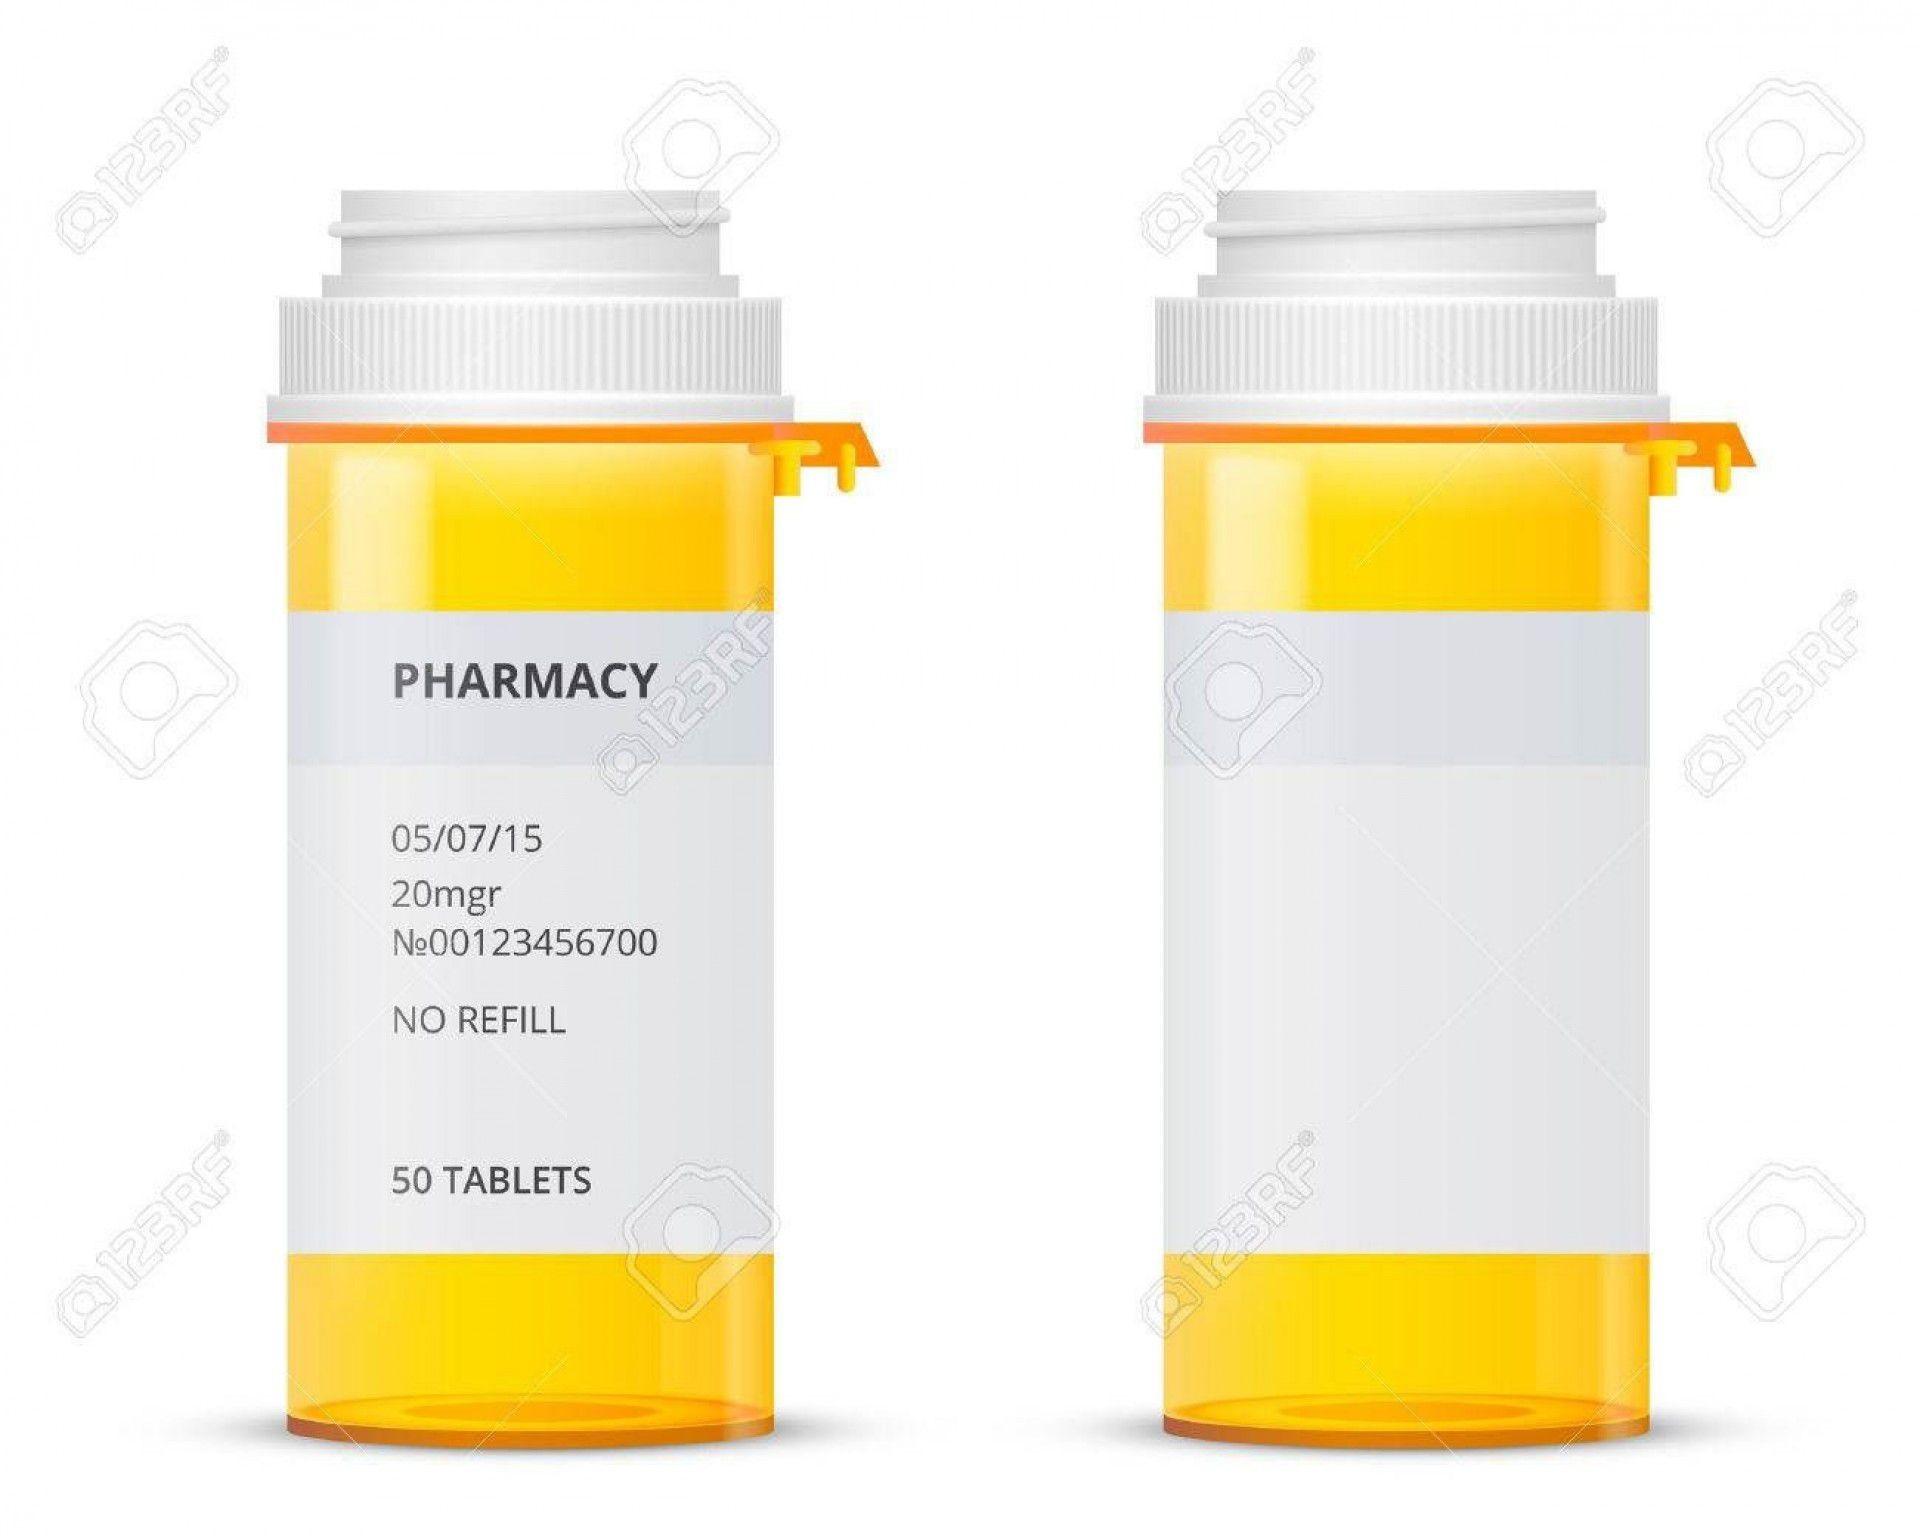 003 Surprising Fake Prescription Bottle Label Template Picture 1920